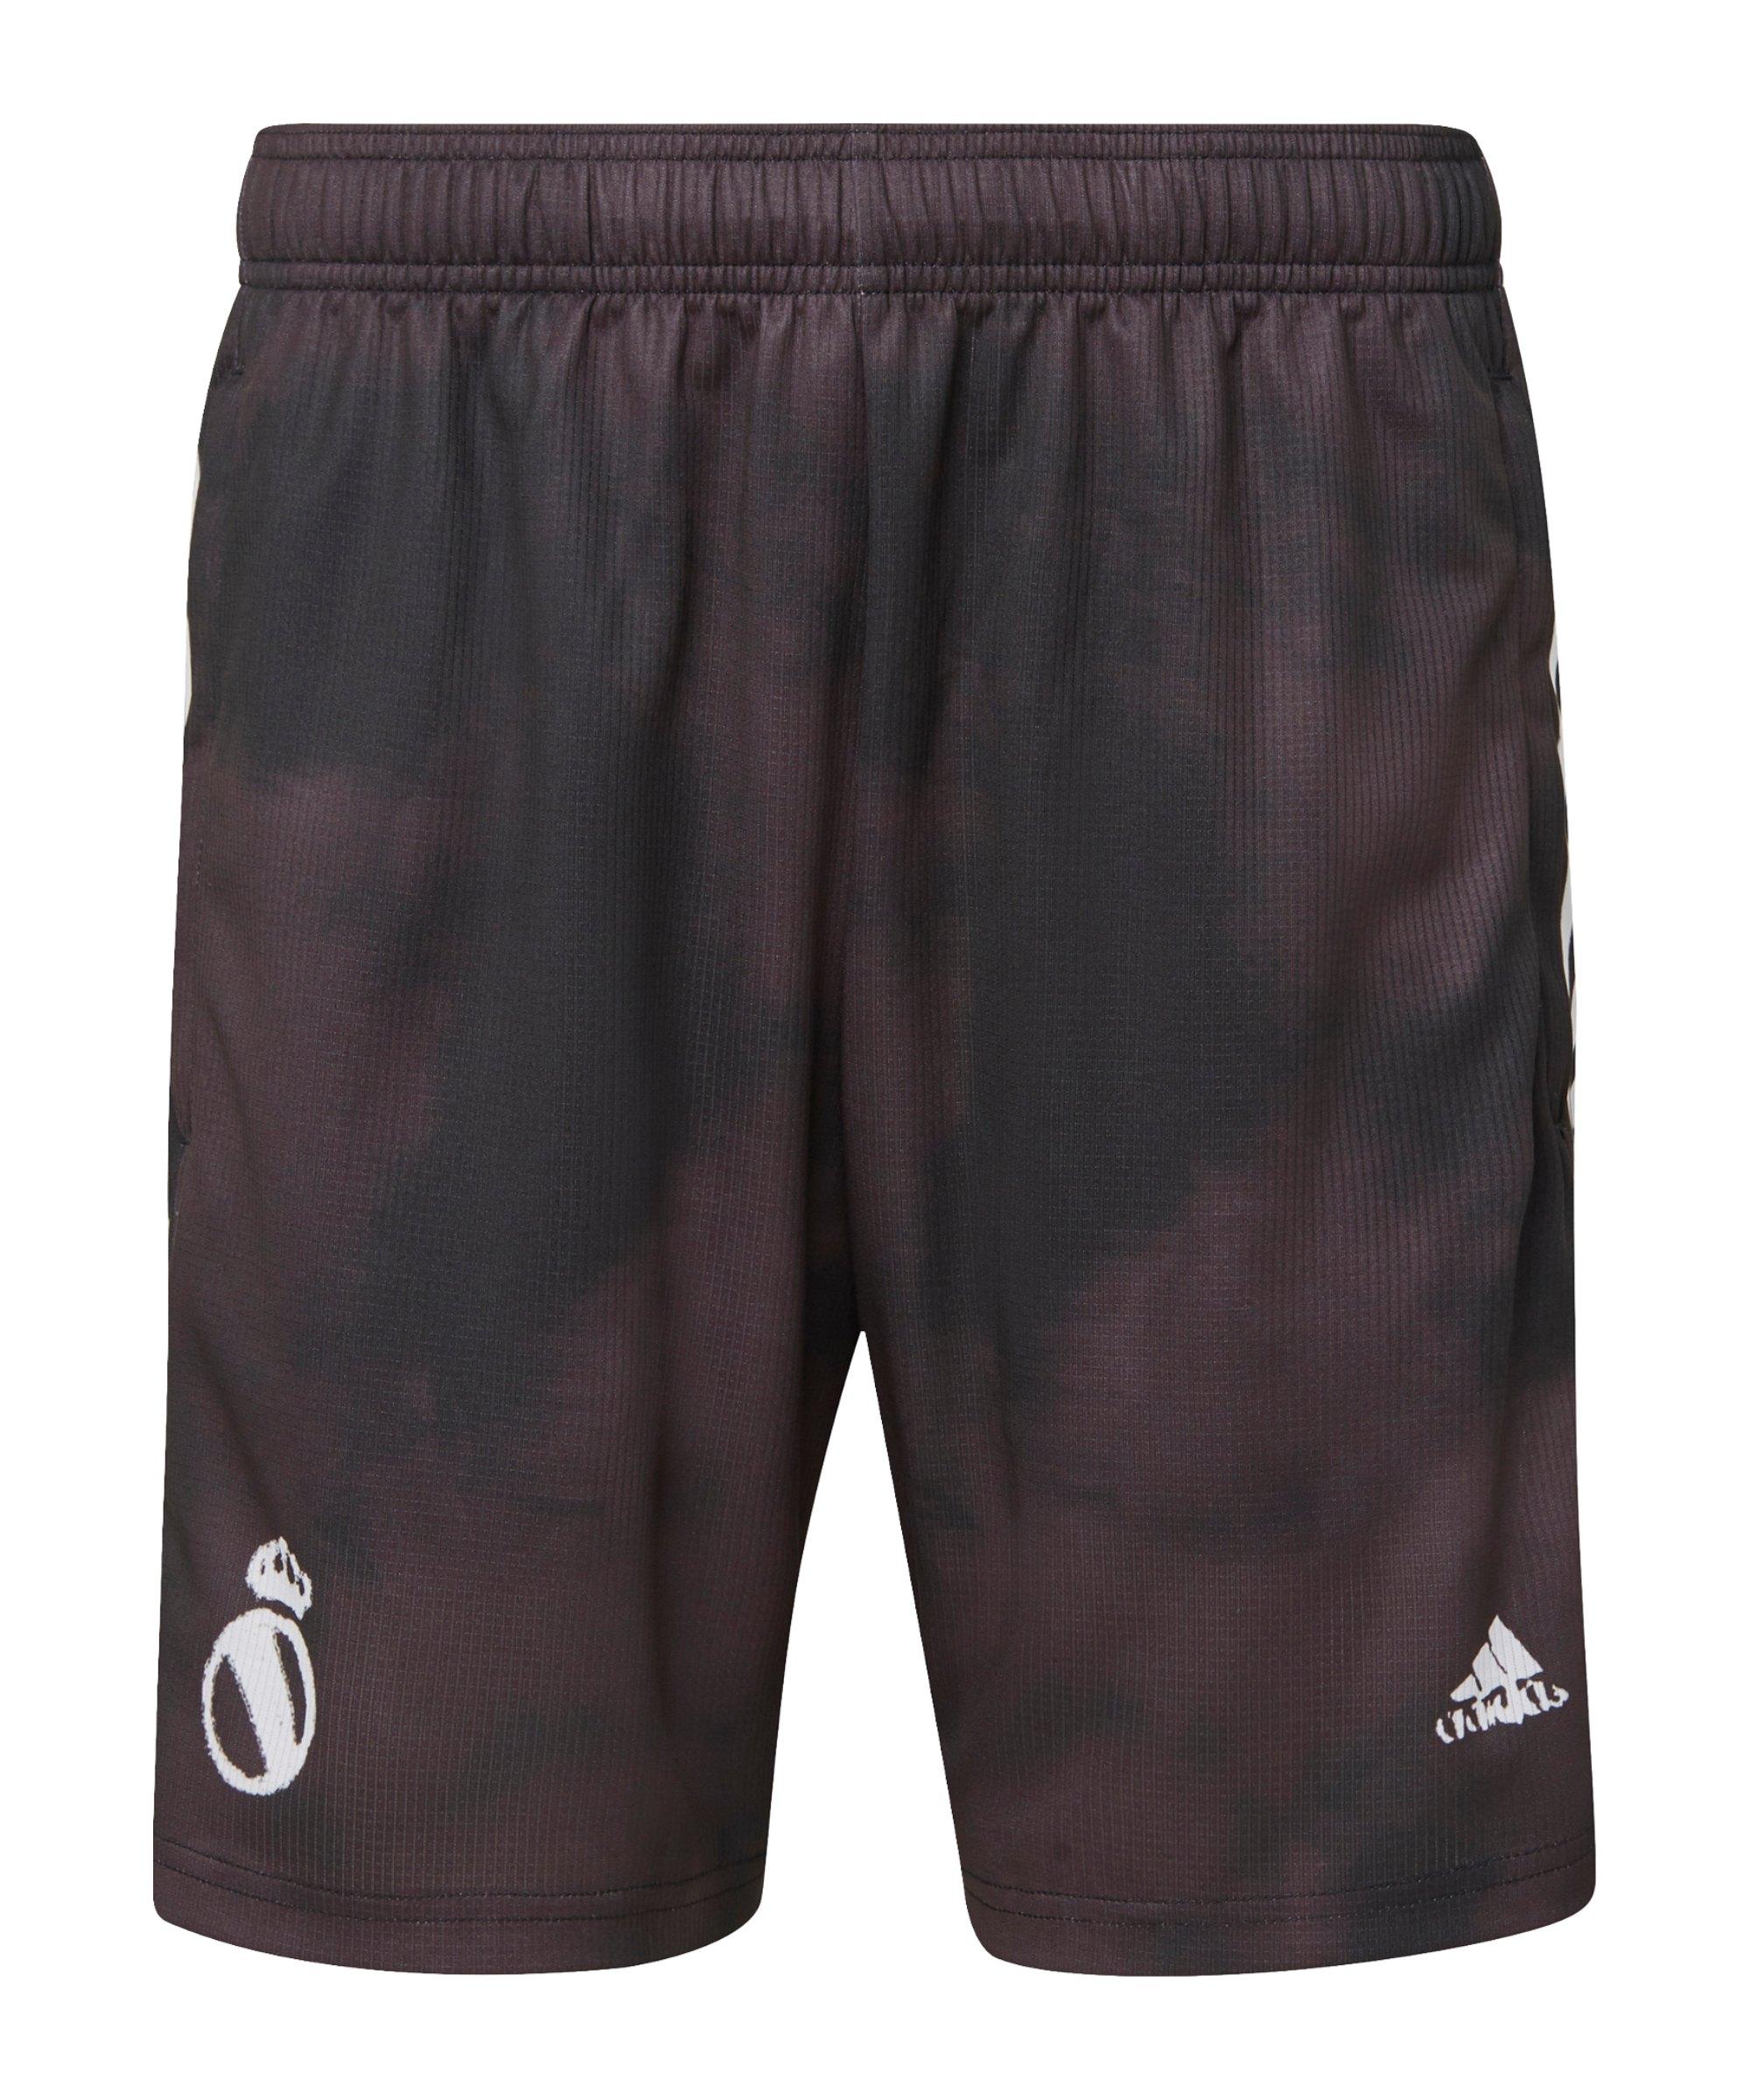 adidas Real Madrid Human Race Short Schwarz Weiss - schwarz